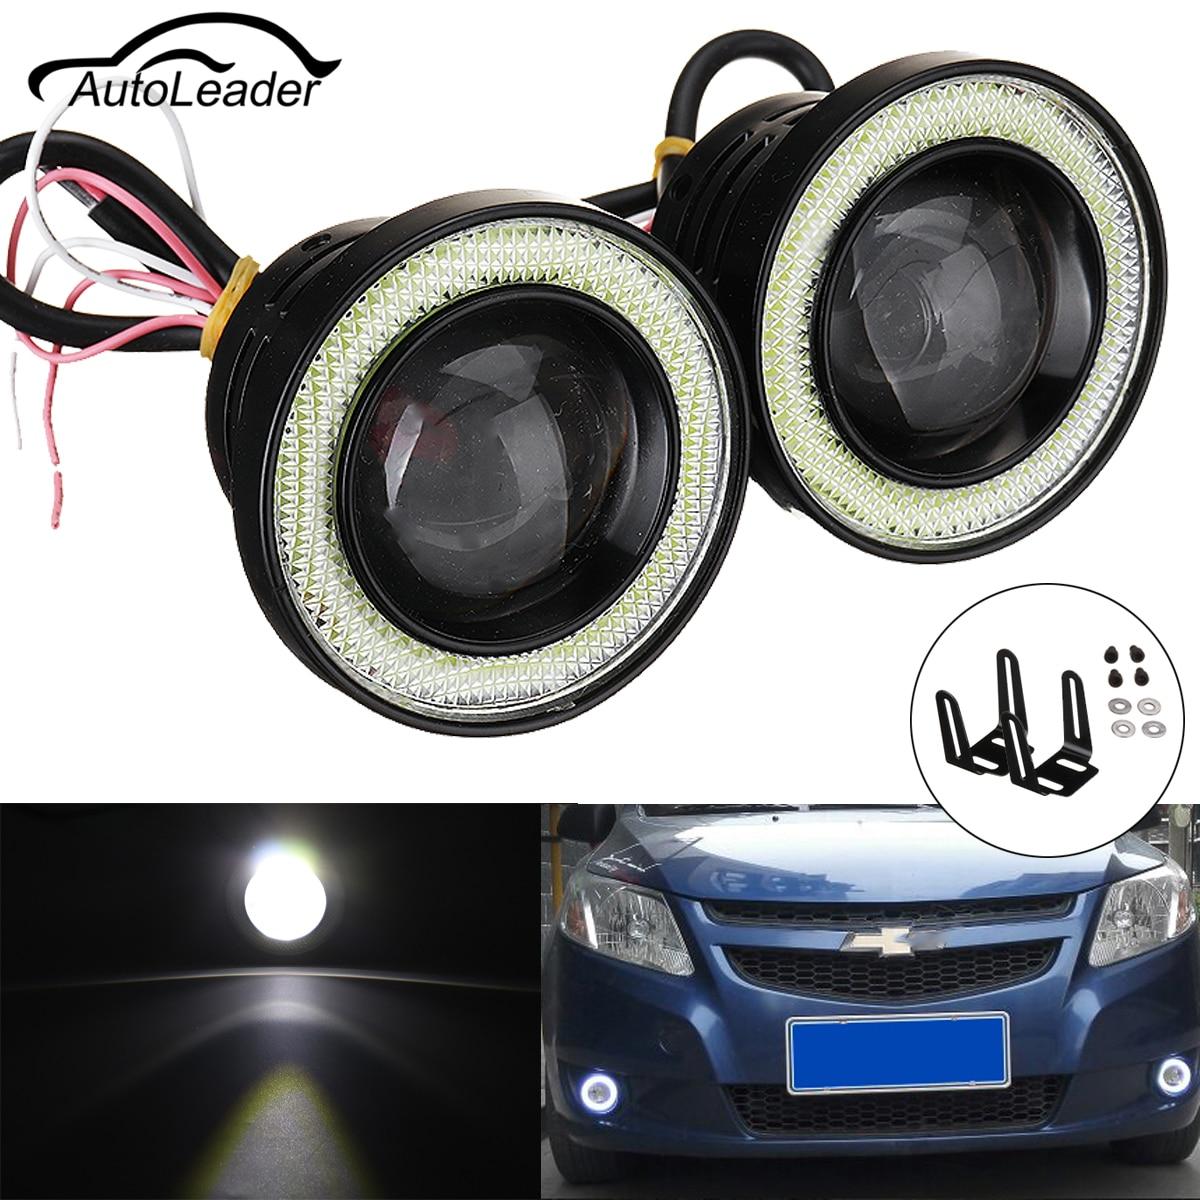 2Pcs/Set 2.5 30W 12V Car Angel Eye COB Halo Ring White Car LED DRL Projector Len Fog Driving Light Lamp Daytime Running Lig мустела бебе колд крем 40мл